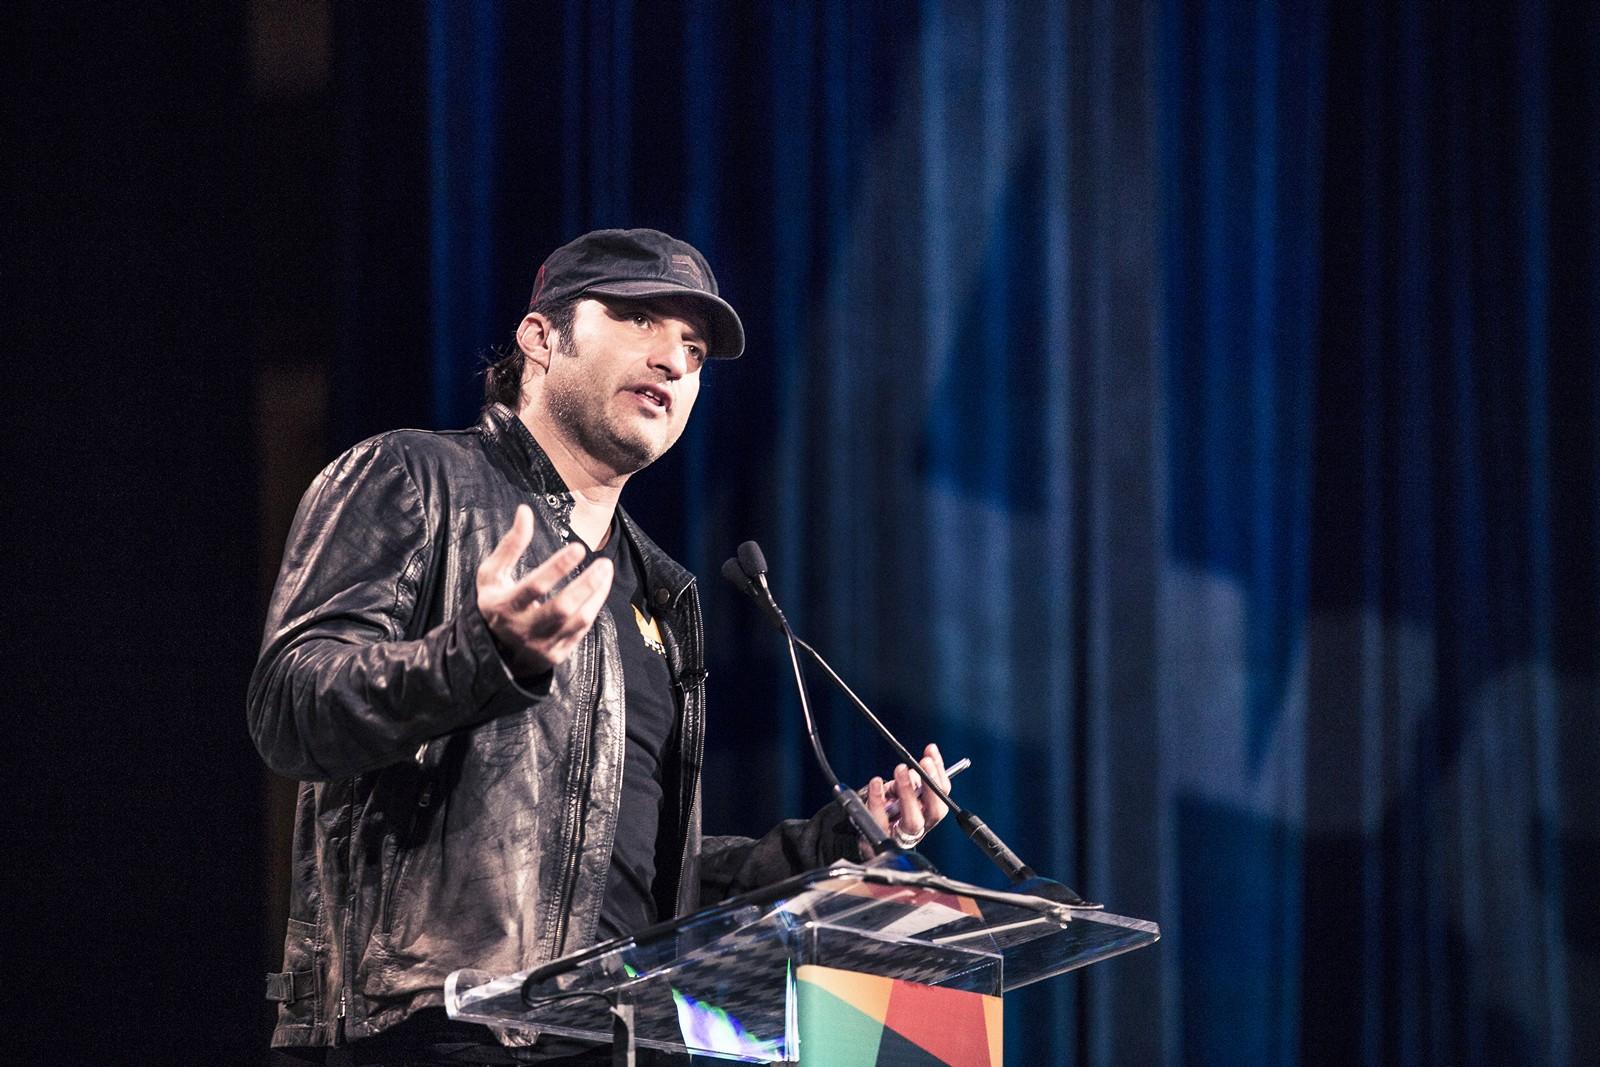 Filmmaker Robert Rodriguez Has Some Encouraging Advice for Creative People